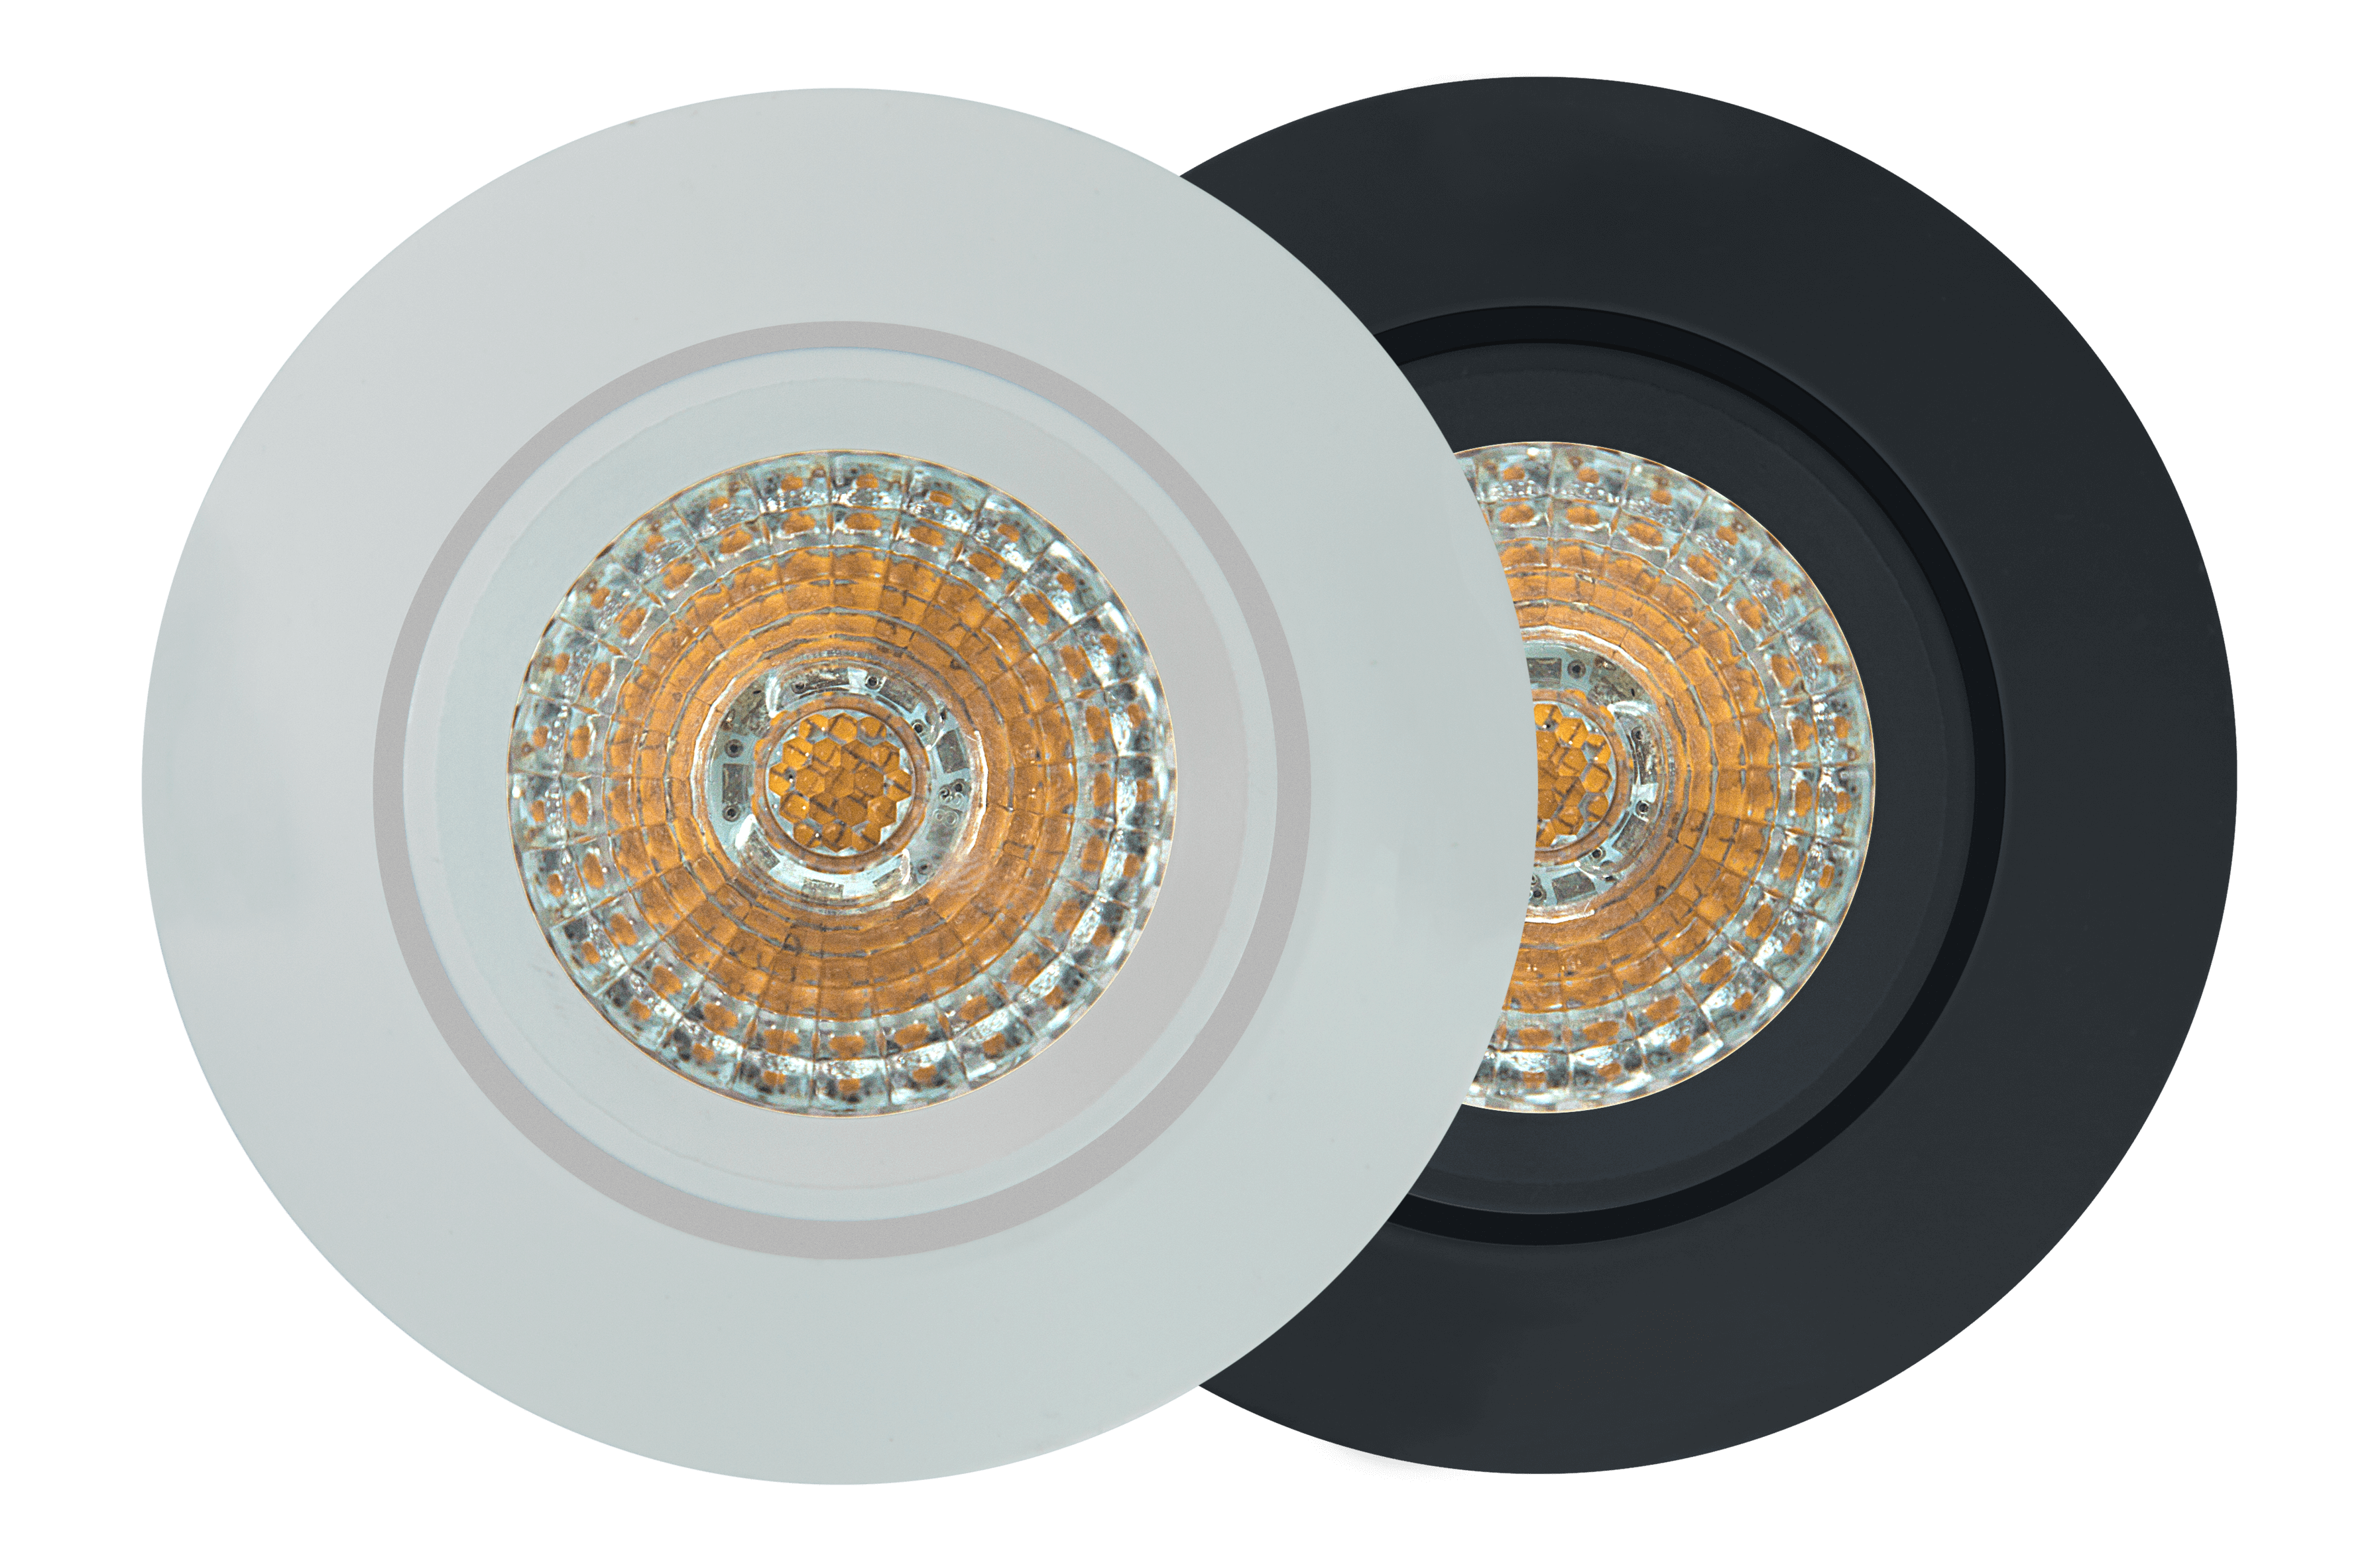 Loxone LED Spot WW 24V - Weiss und Anthrazit